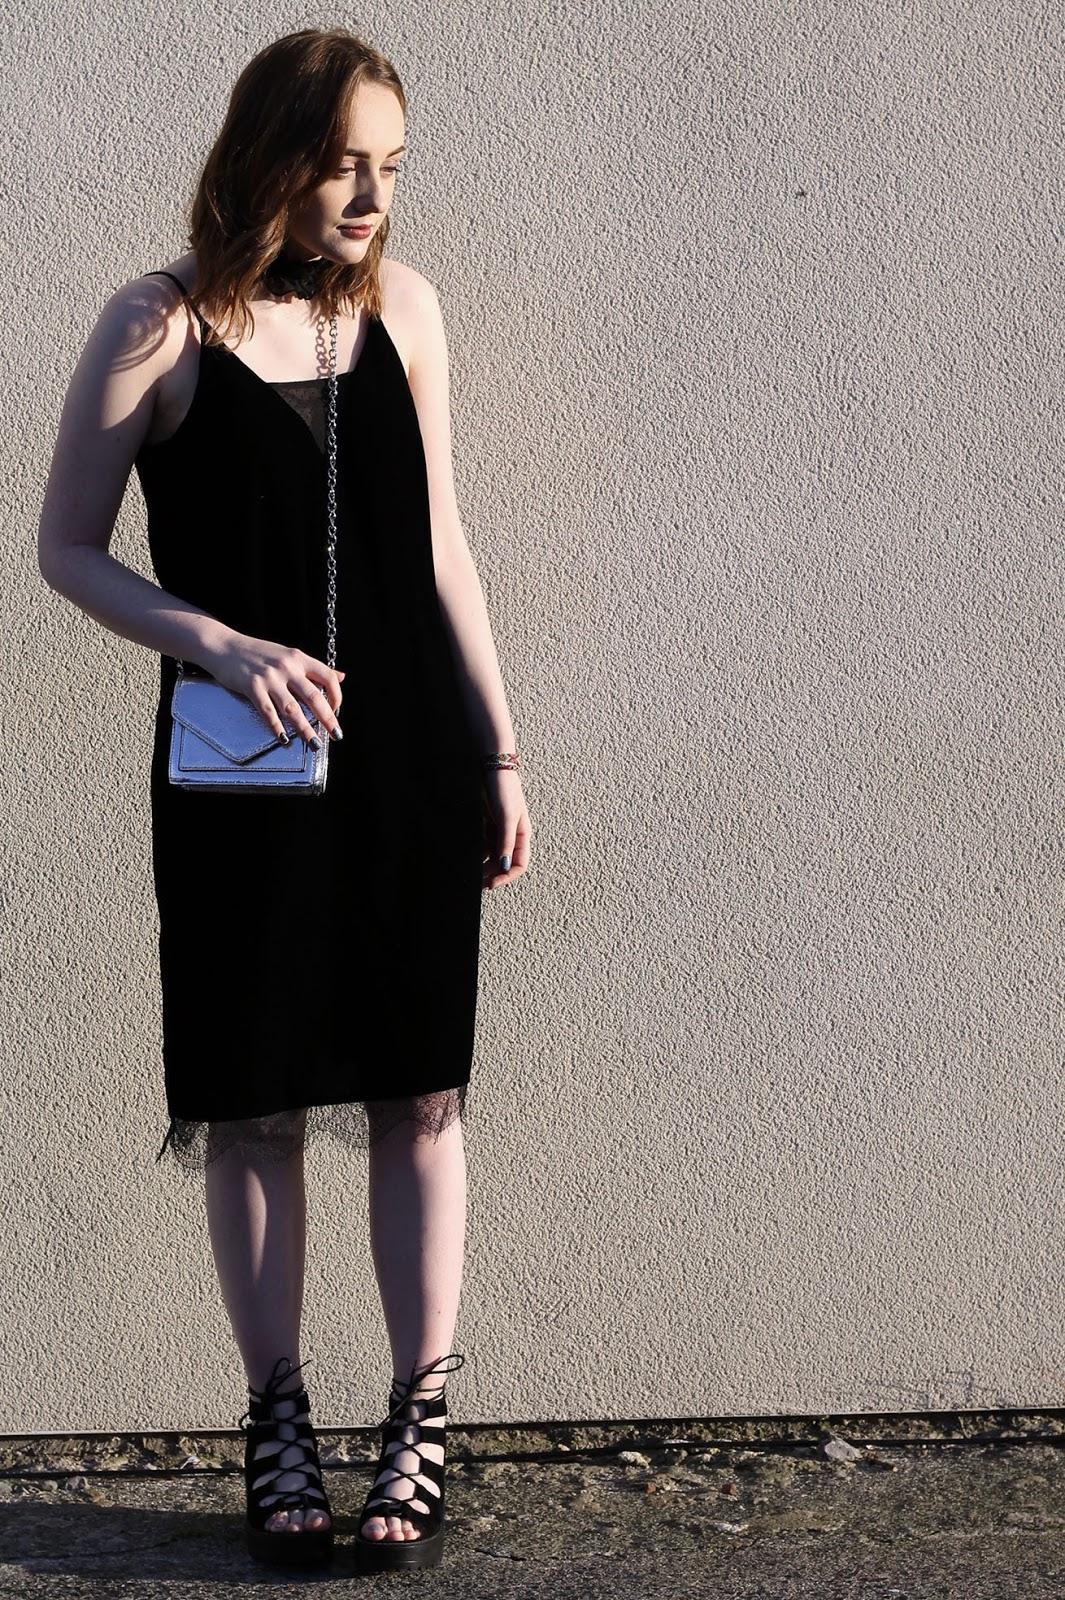 river island midi velvet slip dress and black lace up shoes